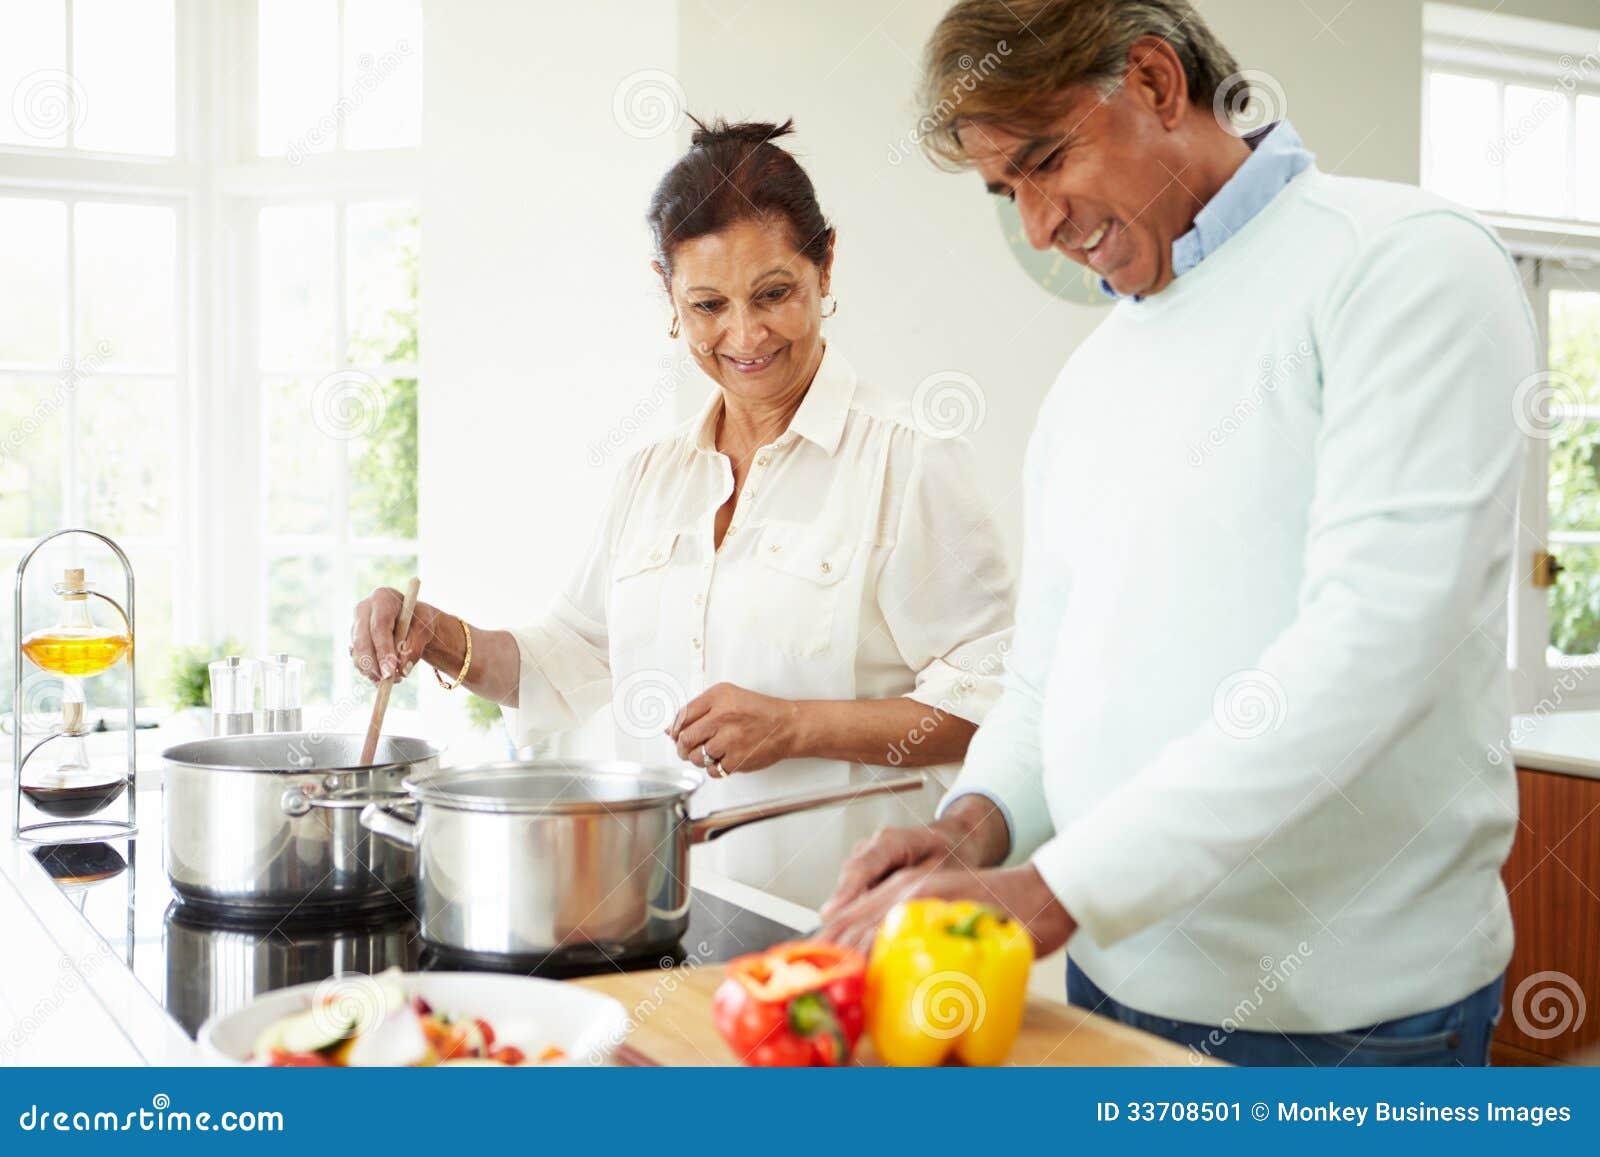 Senior Home Cook Jobs